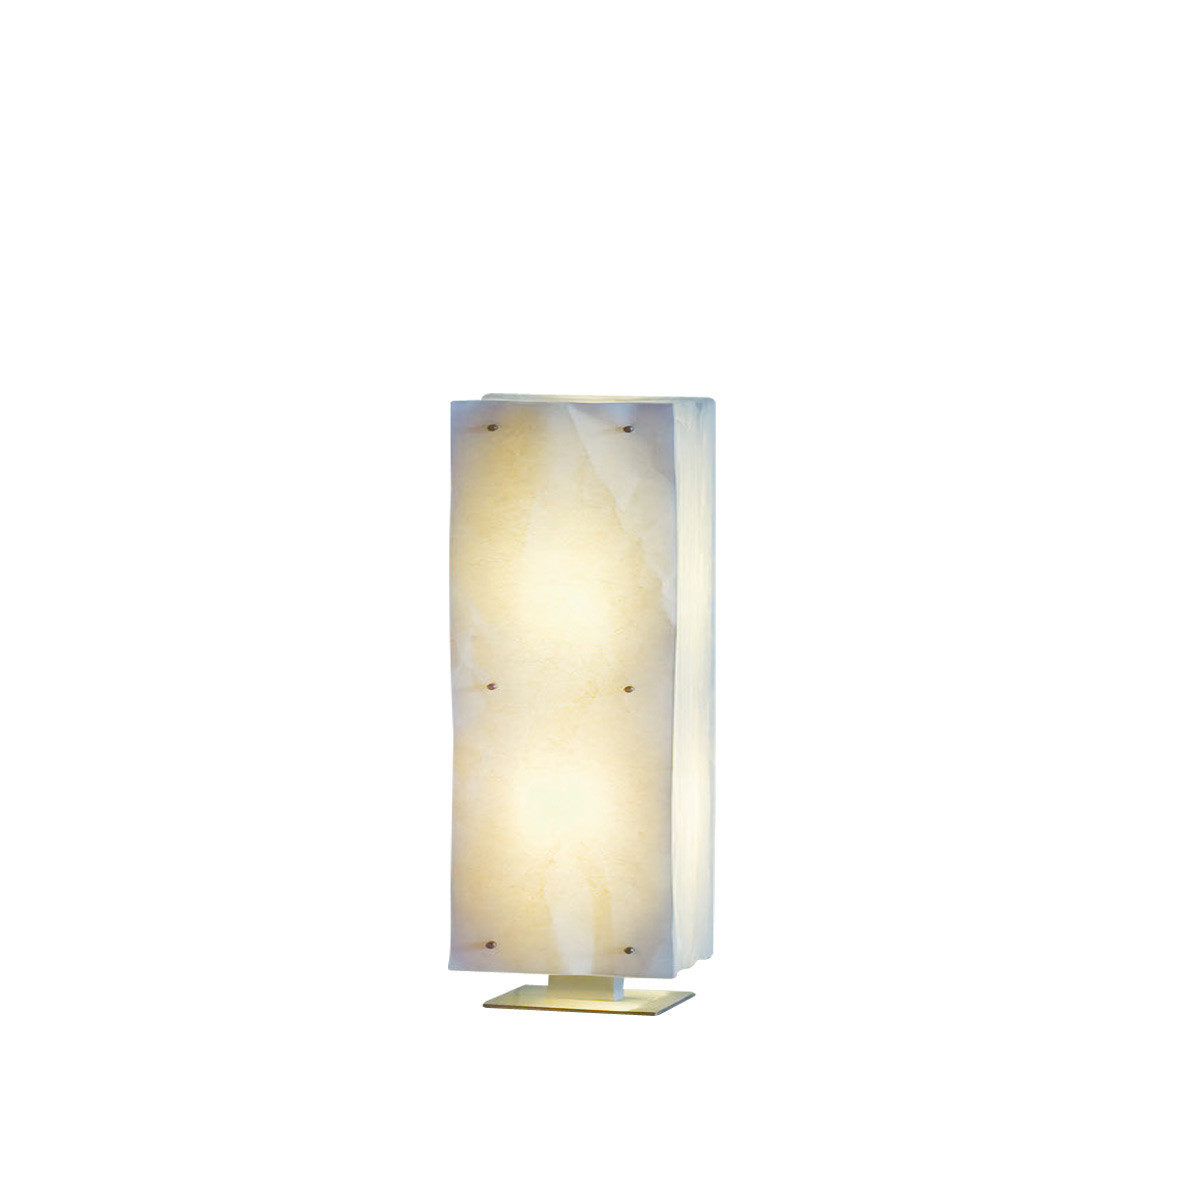 Stehlampe Totem 700 von Steve Léchot Luminaires